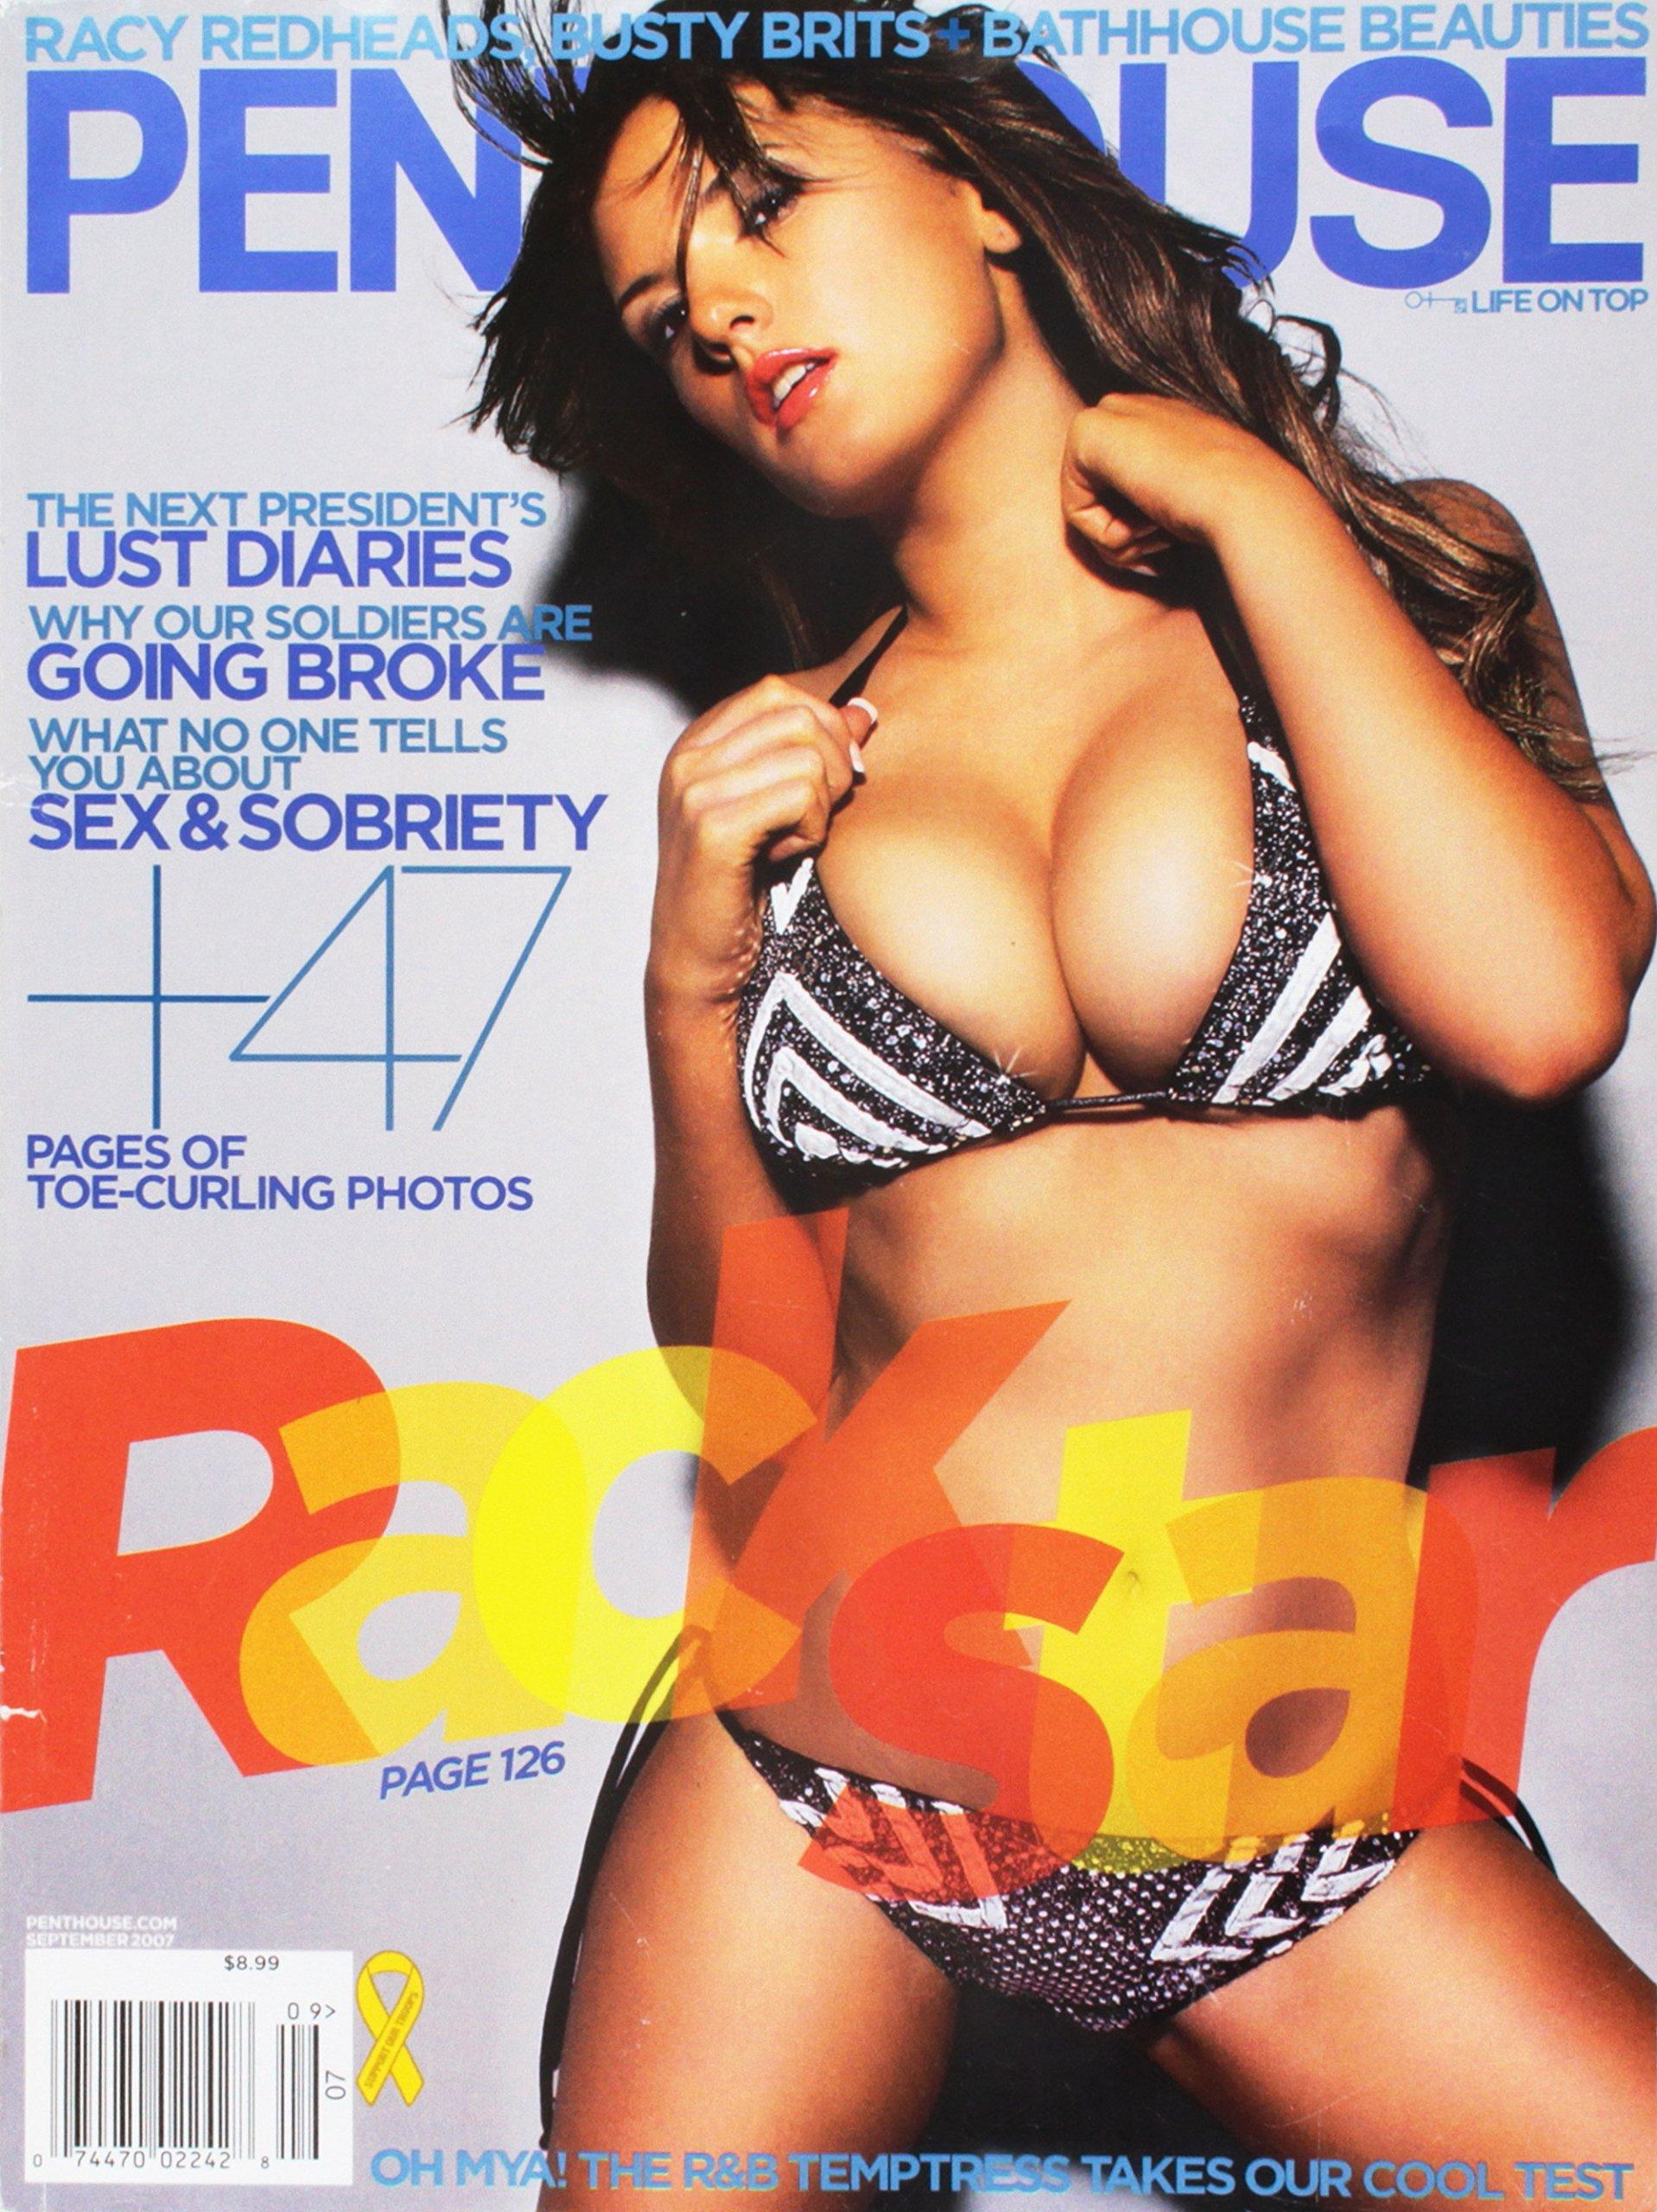 Penthouse Men's Magazine Nicci Capan September 2007 ebook